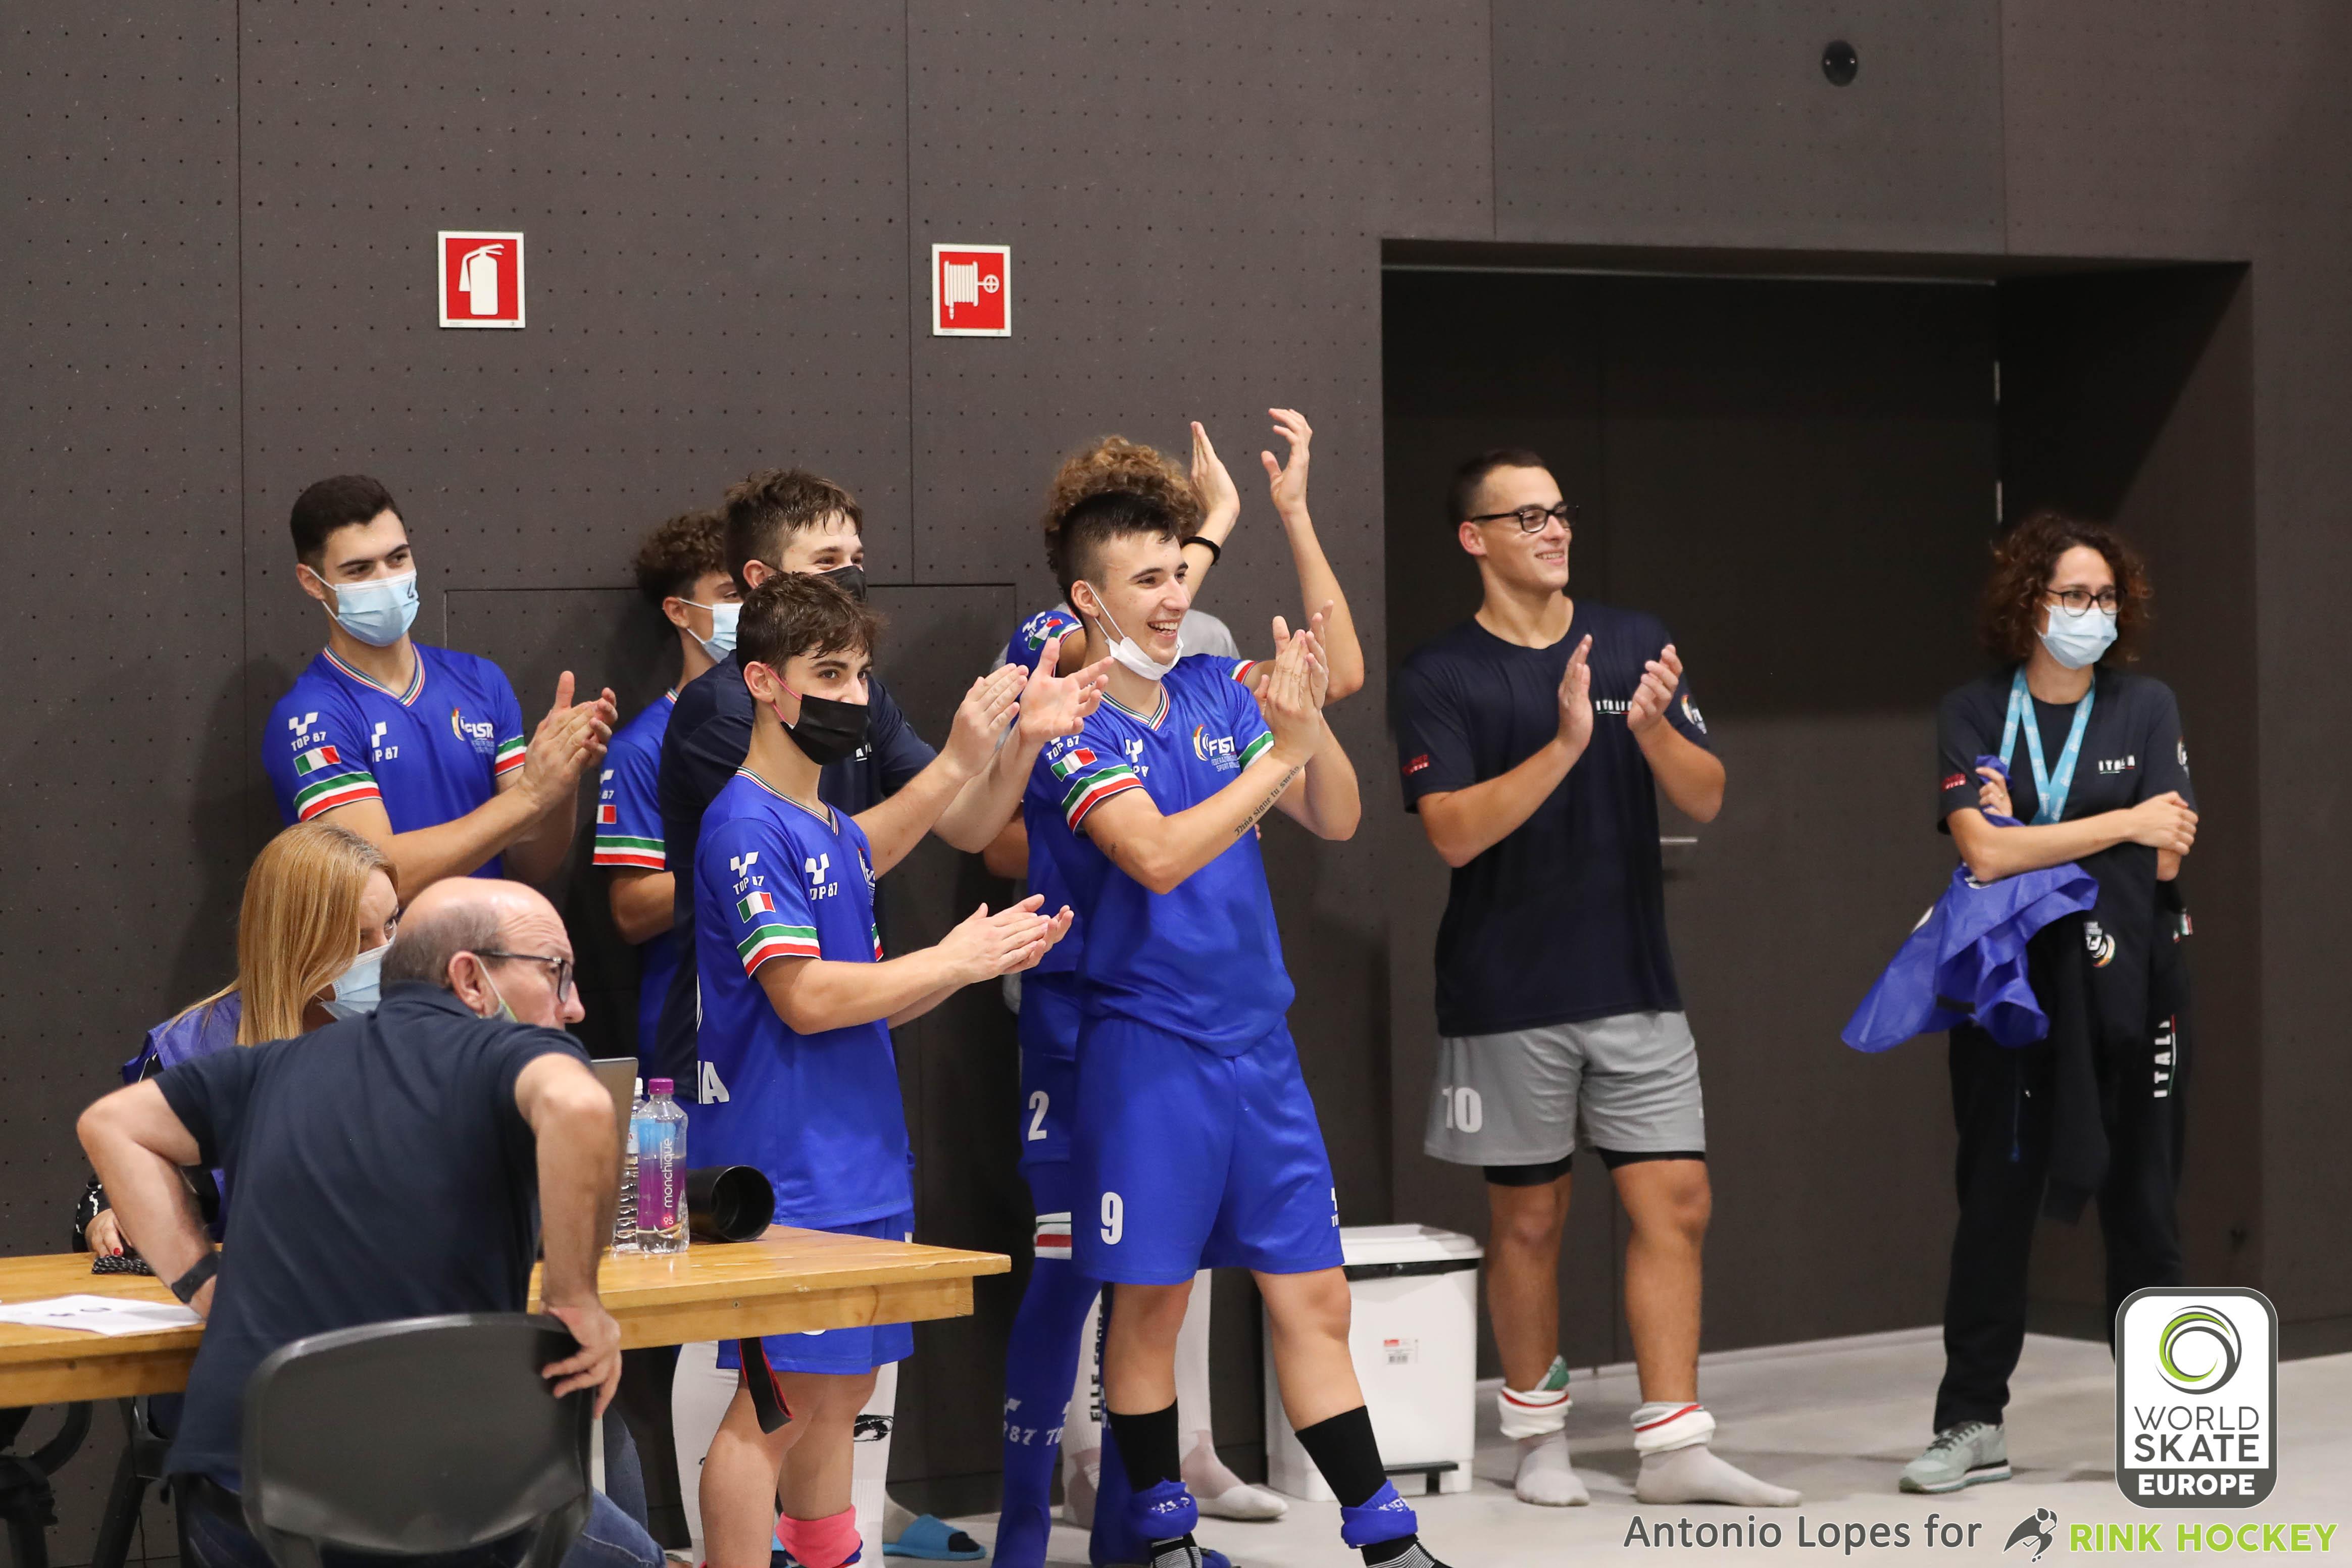 Italia-com-Franca-17-814